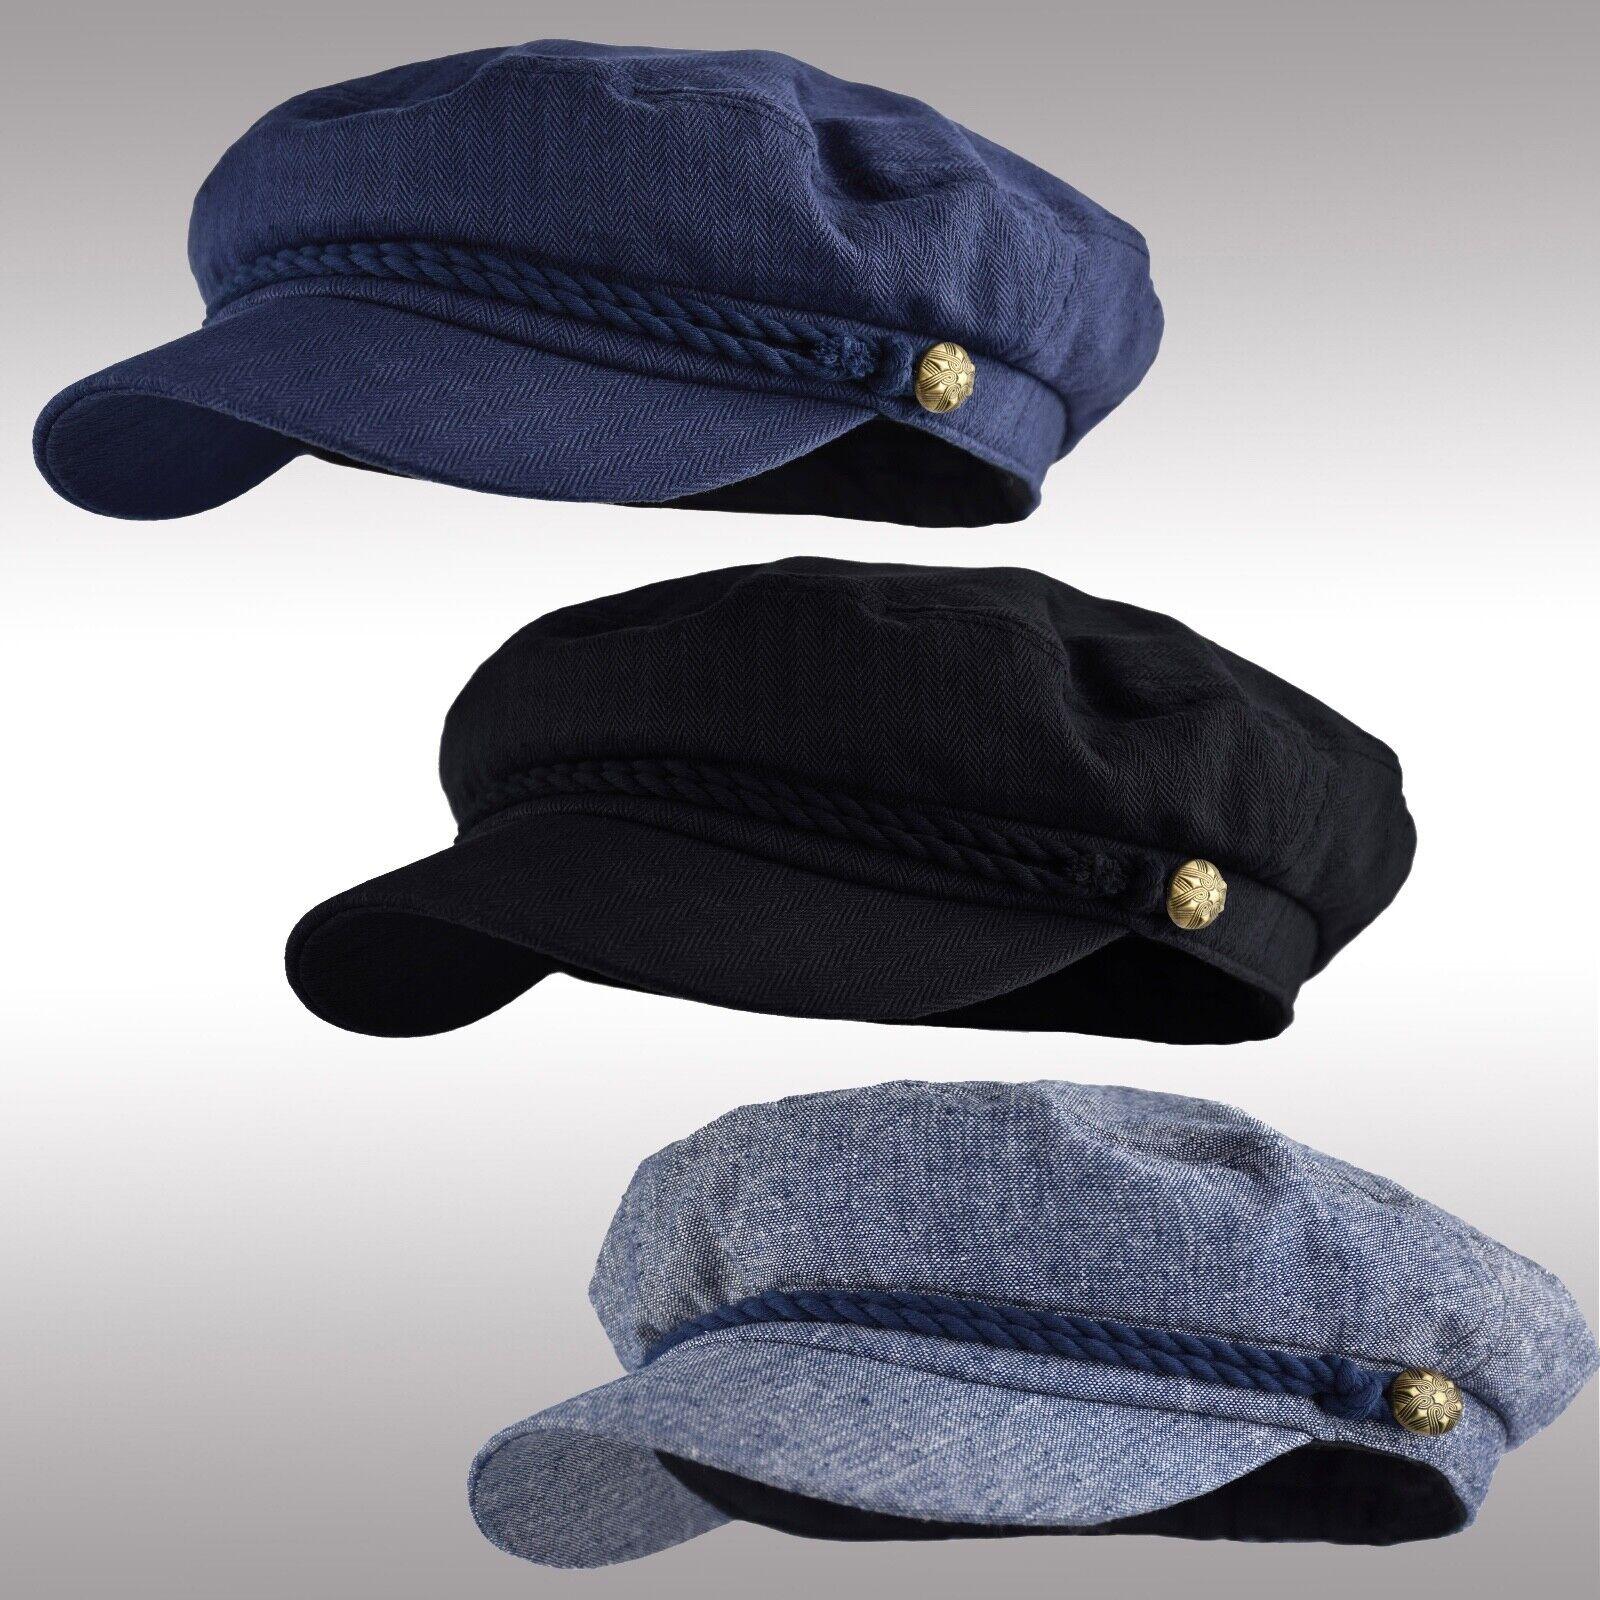 greek fishermans                                     hat